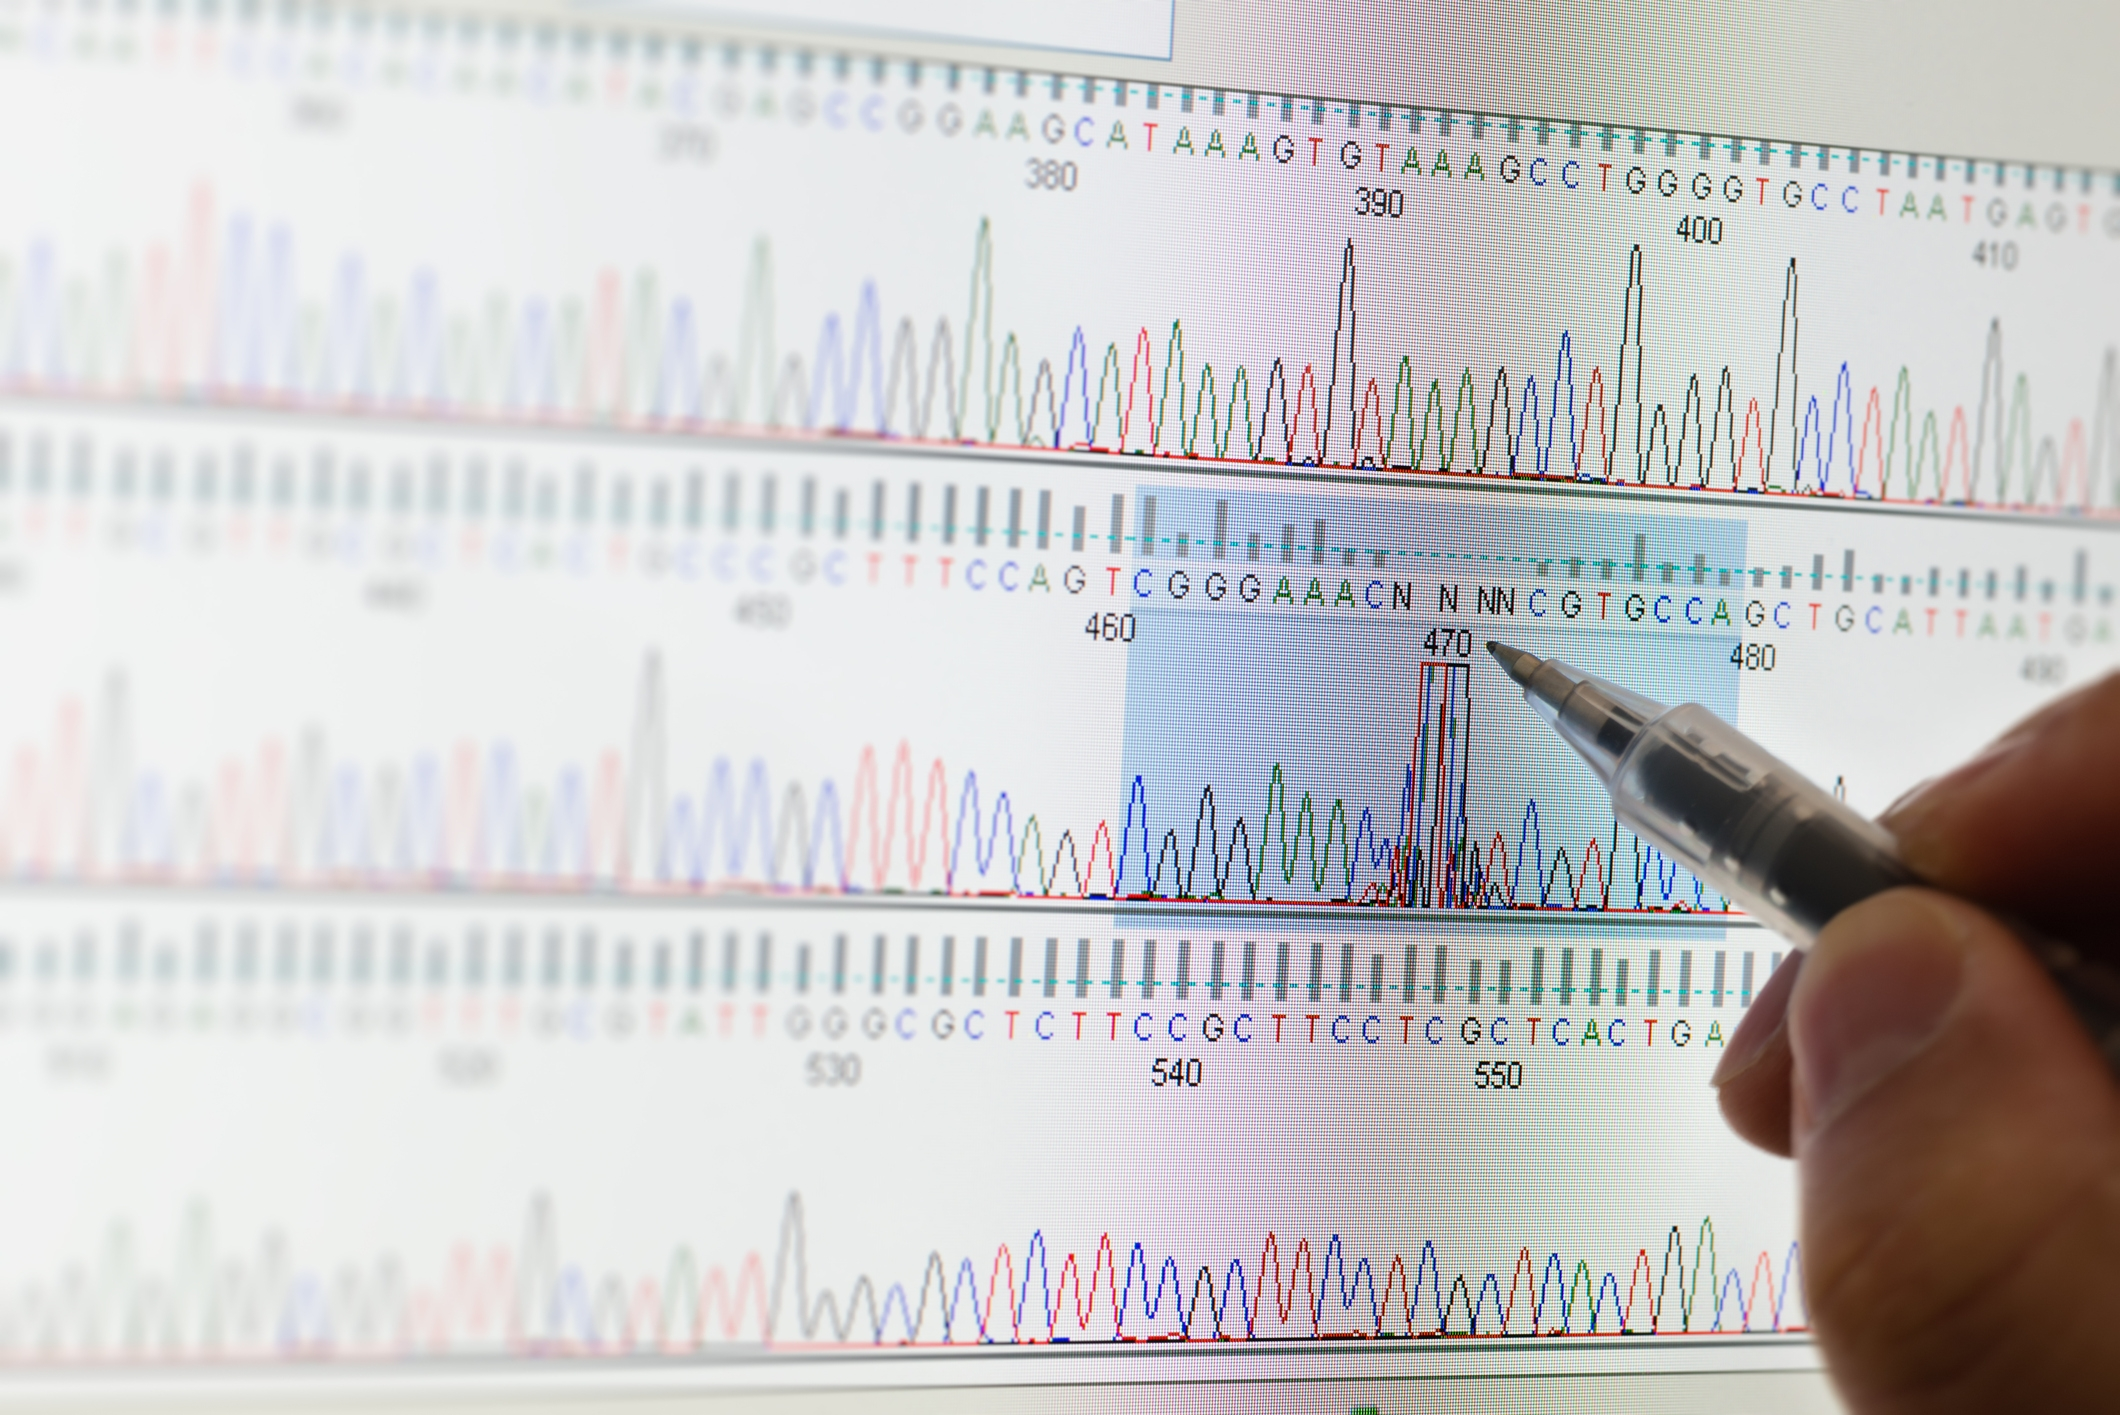 Breakthrough analysis of metabolic parameters